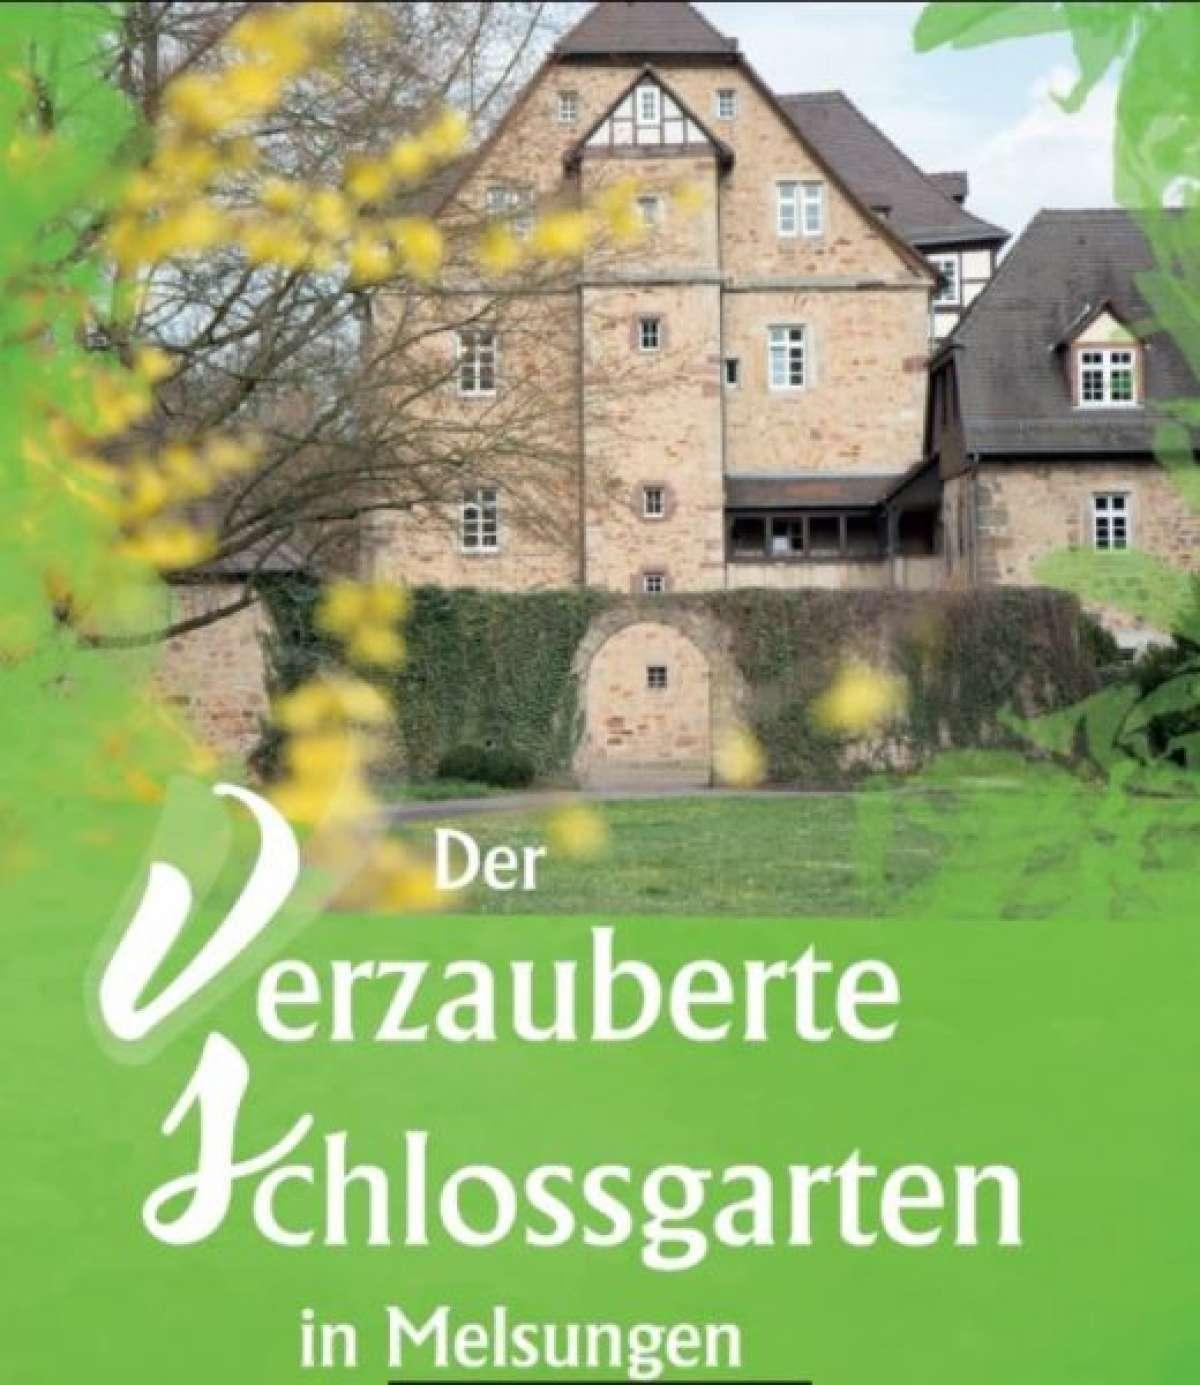 15 Jahre verzauberter Schlossgarten - Ray Binder & Band - Landgrafenschloss  - Melsungen